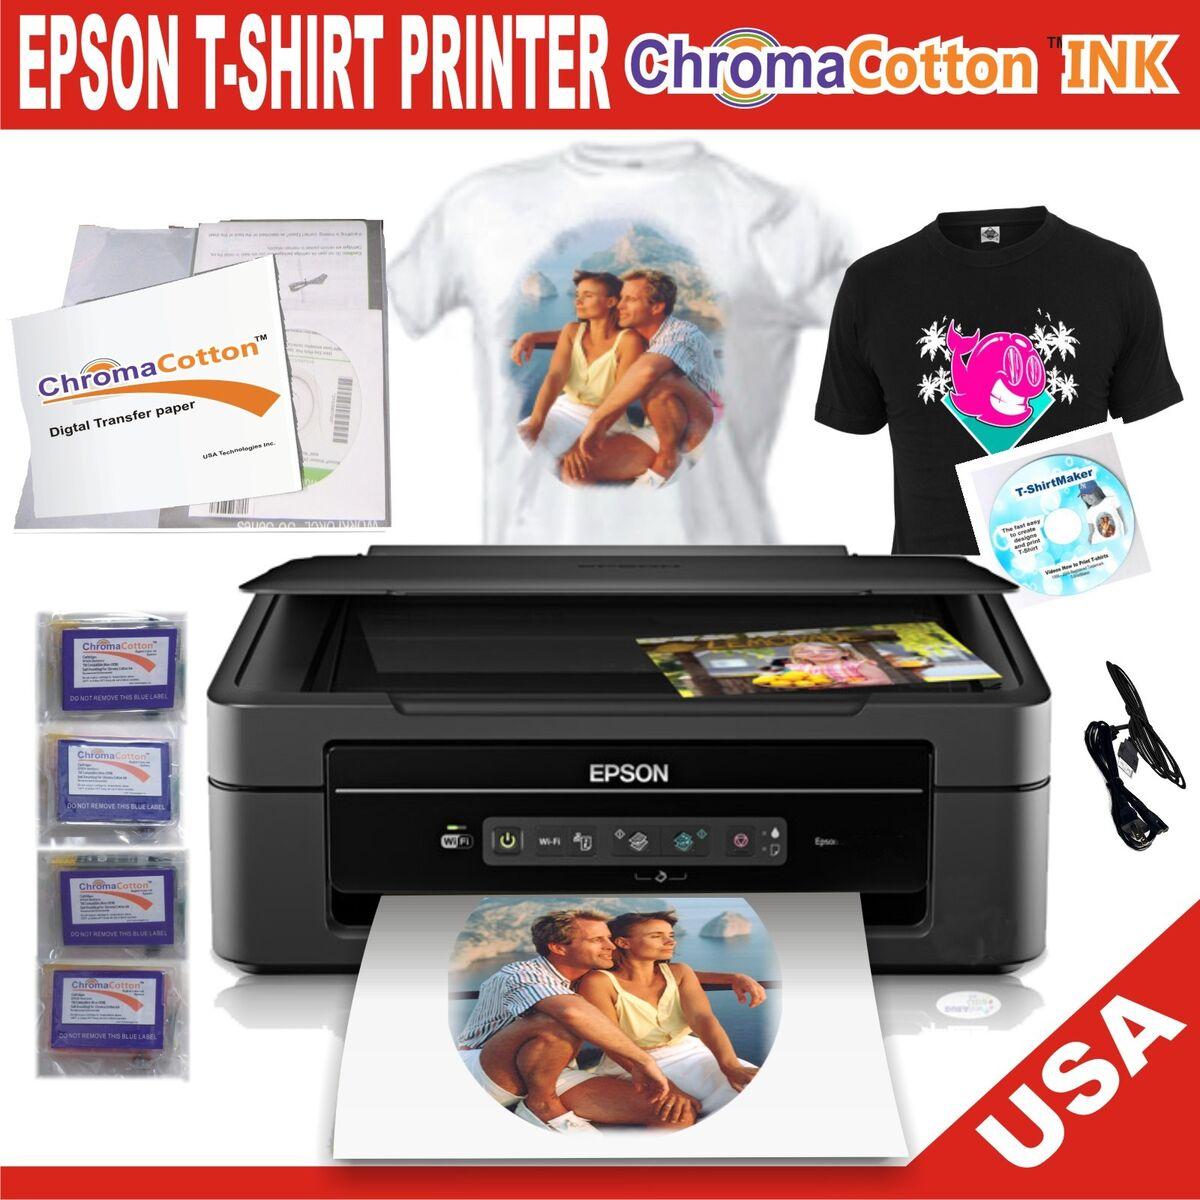 Epson printer t shirt maker with chroma cotton ink for Epson t shirt printer